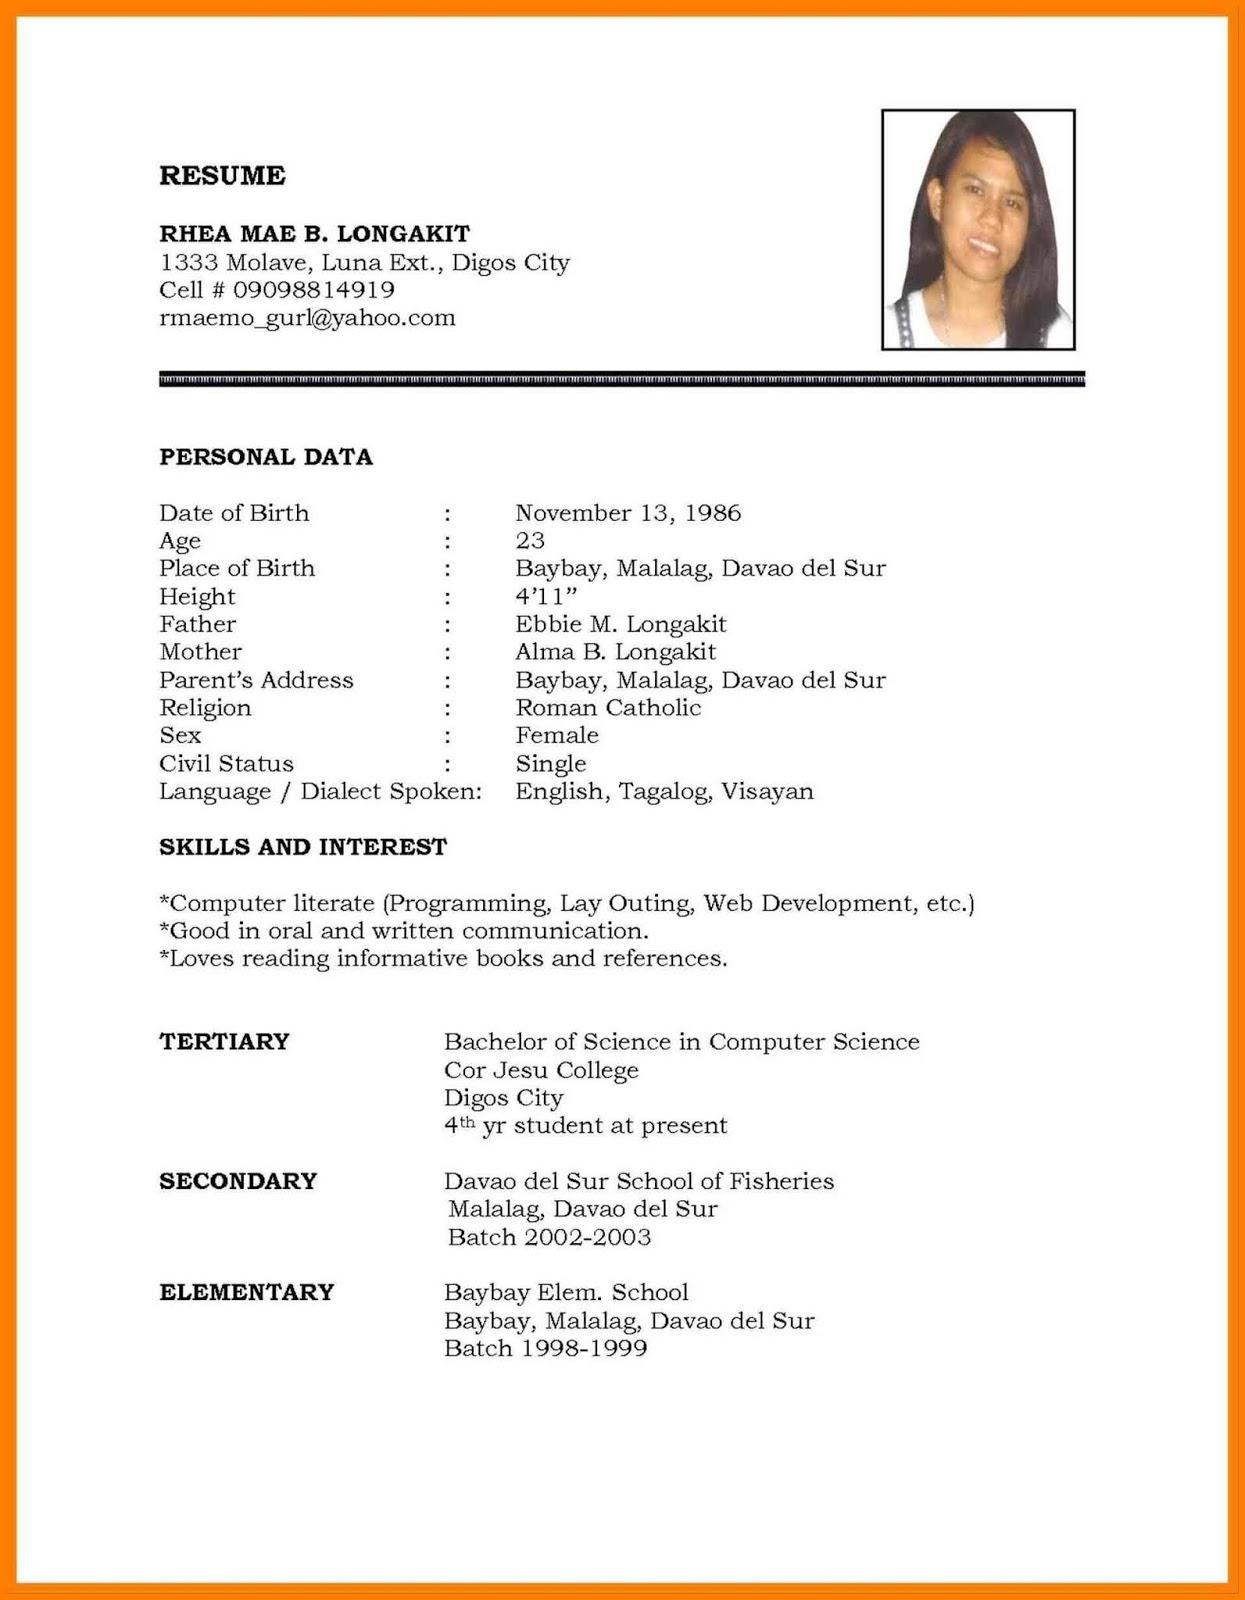 biodata model pdf biodata format pdf download for marriage biodata format pdf biodata format pdf download biodata format pdf free download biodata format pdf download for job biodata format pdf for marriage